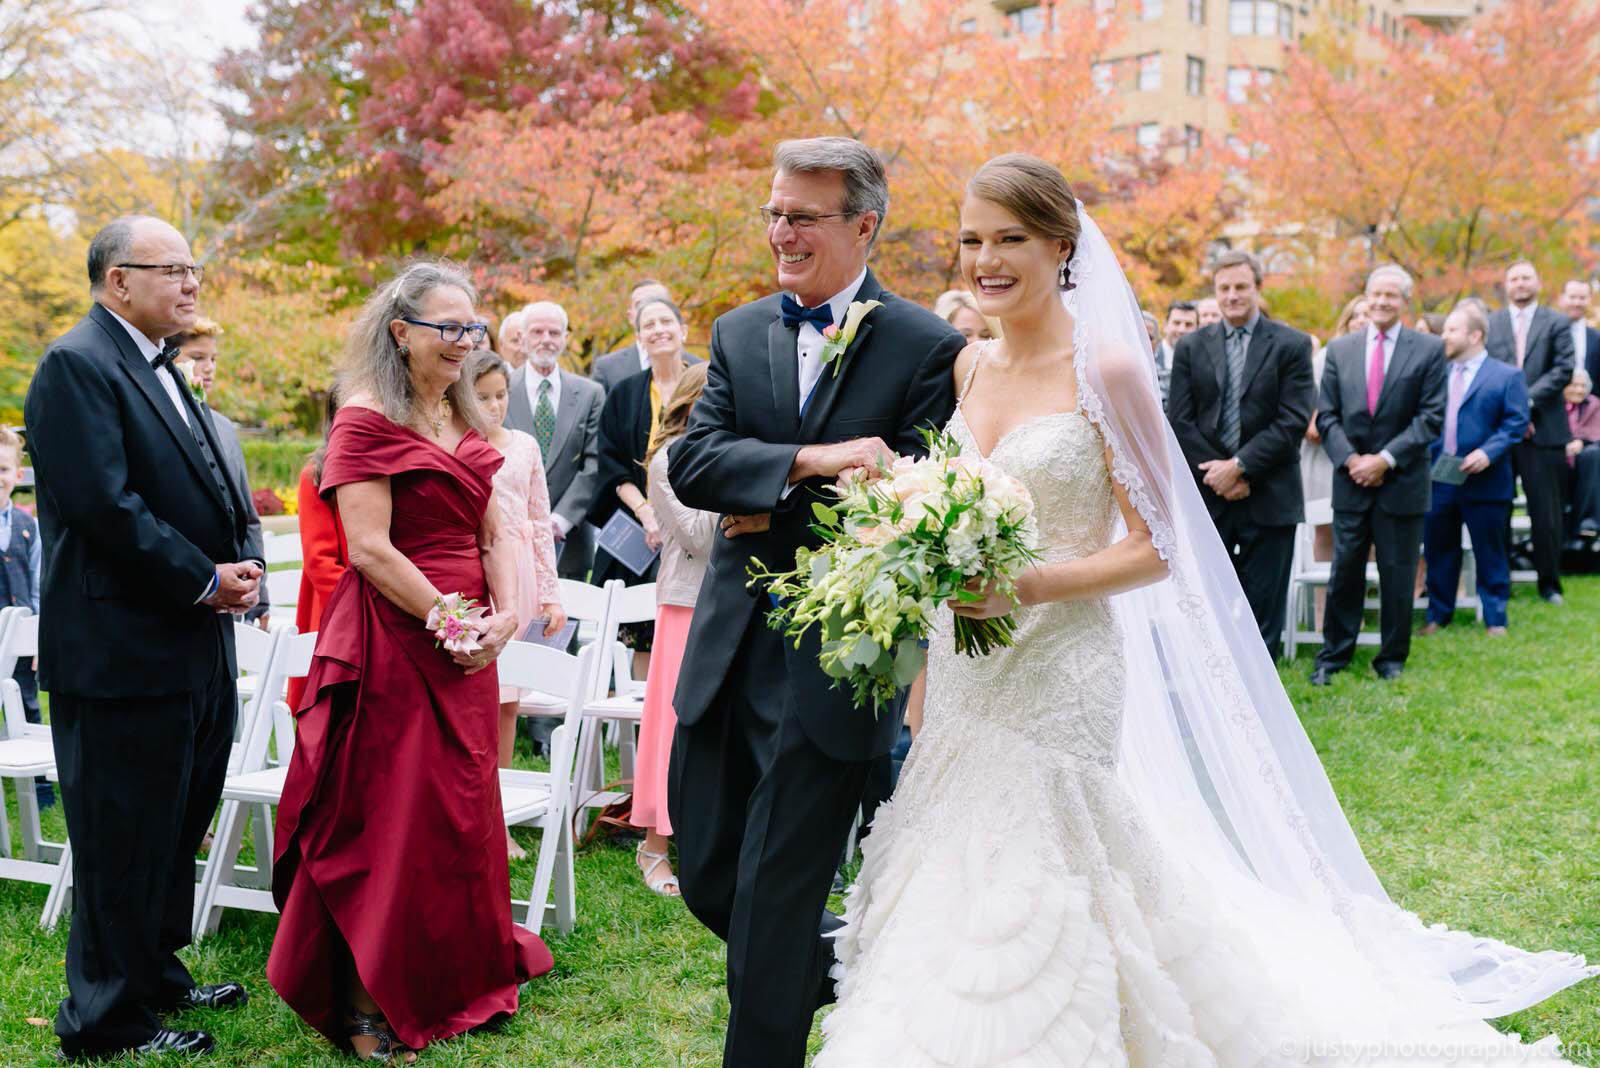 Omni Shoreham wedding photos-washington-dc-wedding-venues (60 of 171).jpg